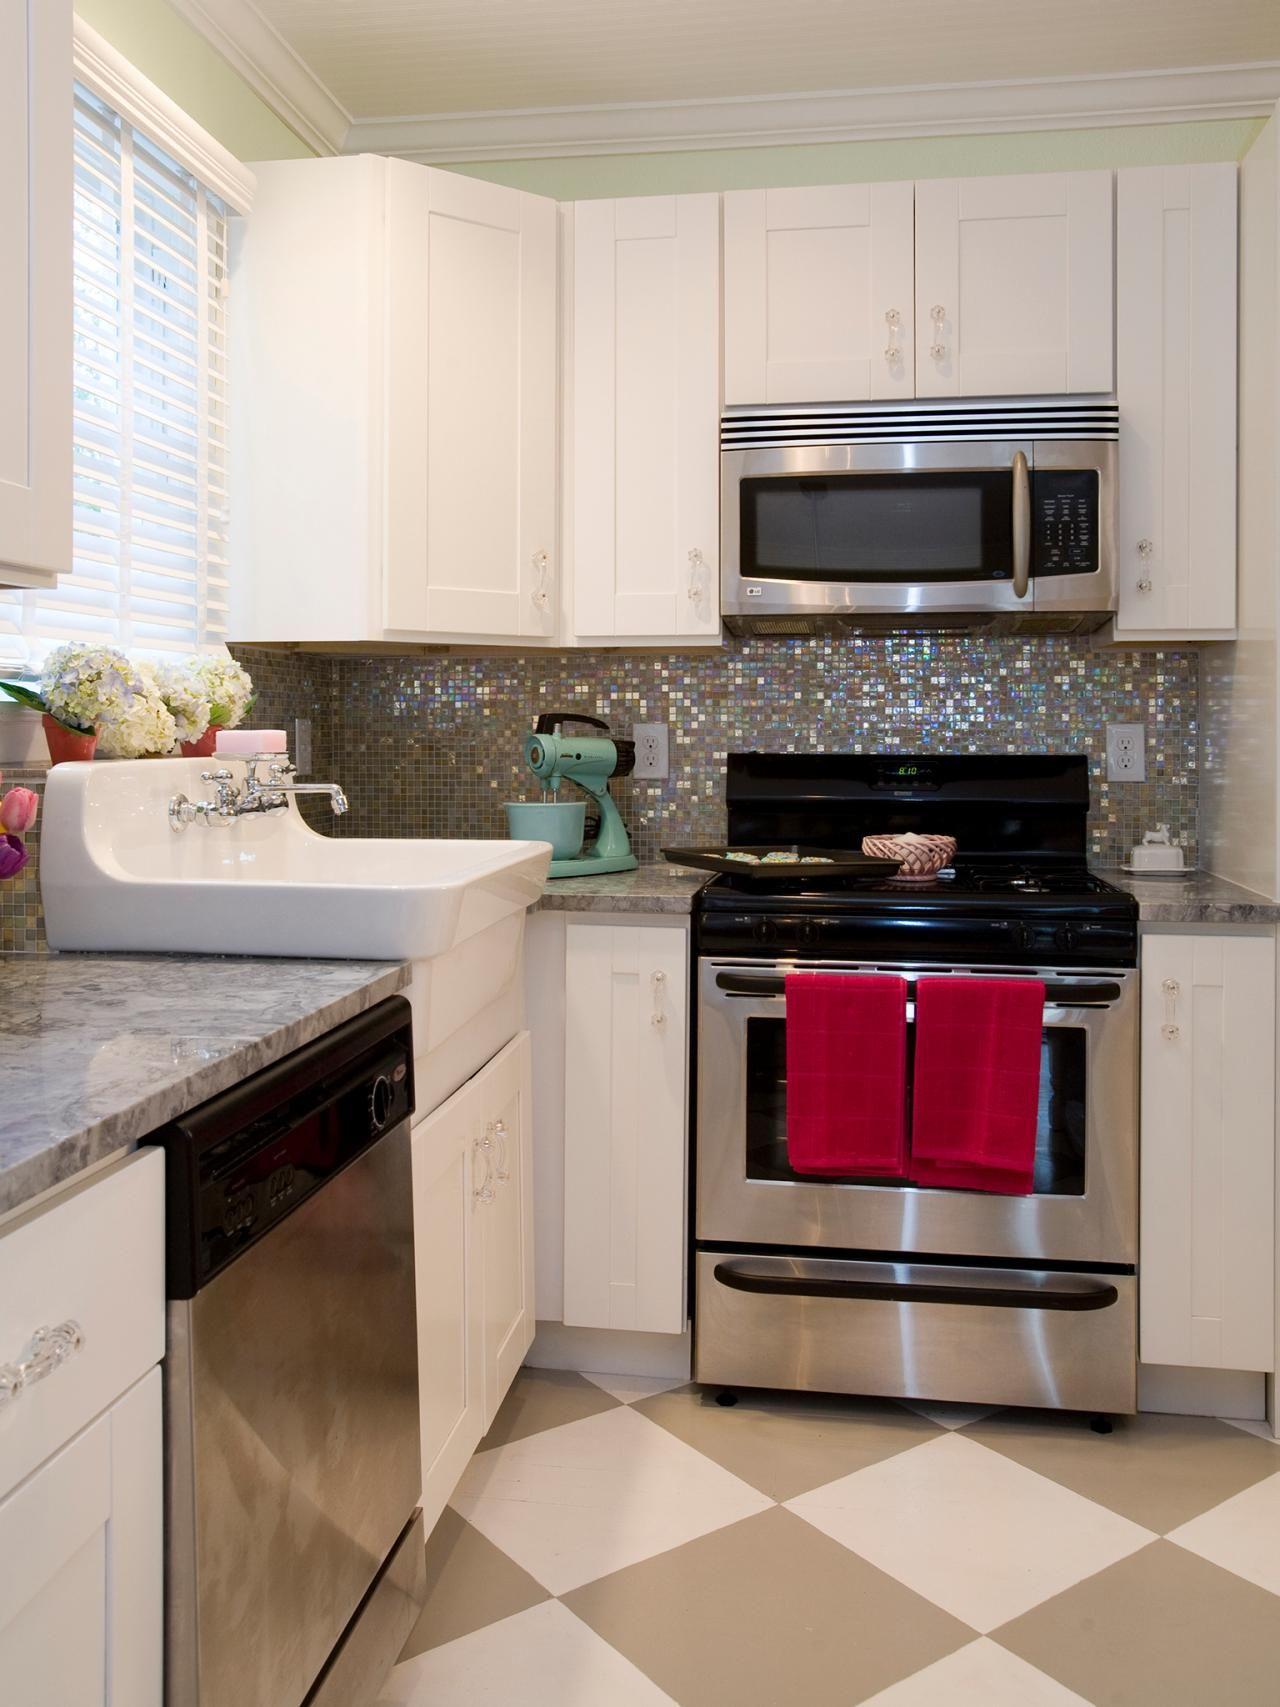 Painting Kitchen Cabinets Antique White Hgtv Pictures Ideas Kitchen Cabinet Color Options Kitchen Backsplash Designs Kitchen Design